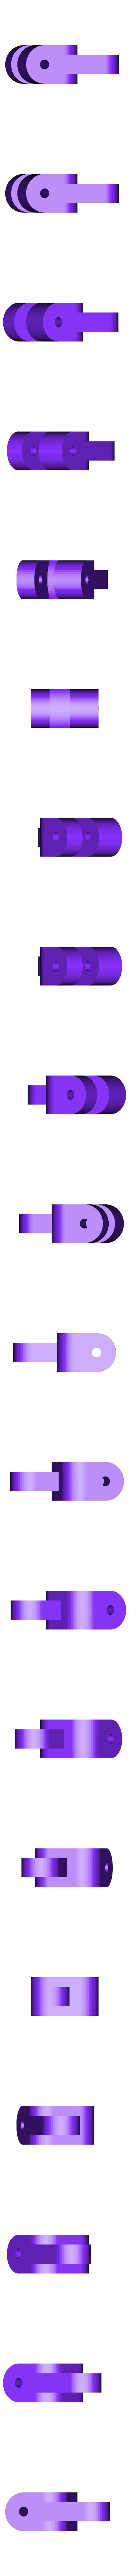 small_hinge.stl Download free STL file 8 legged spider robot • 3D print design, brianbrocken